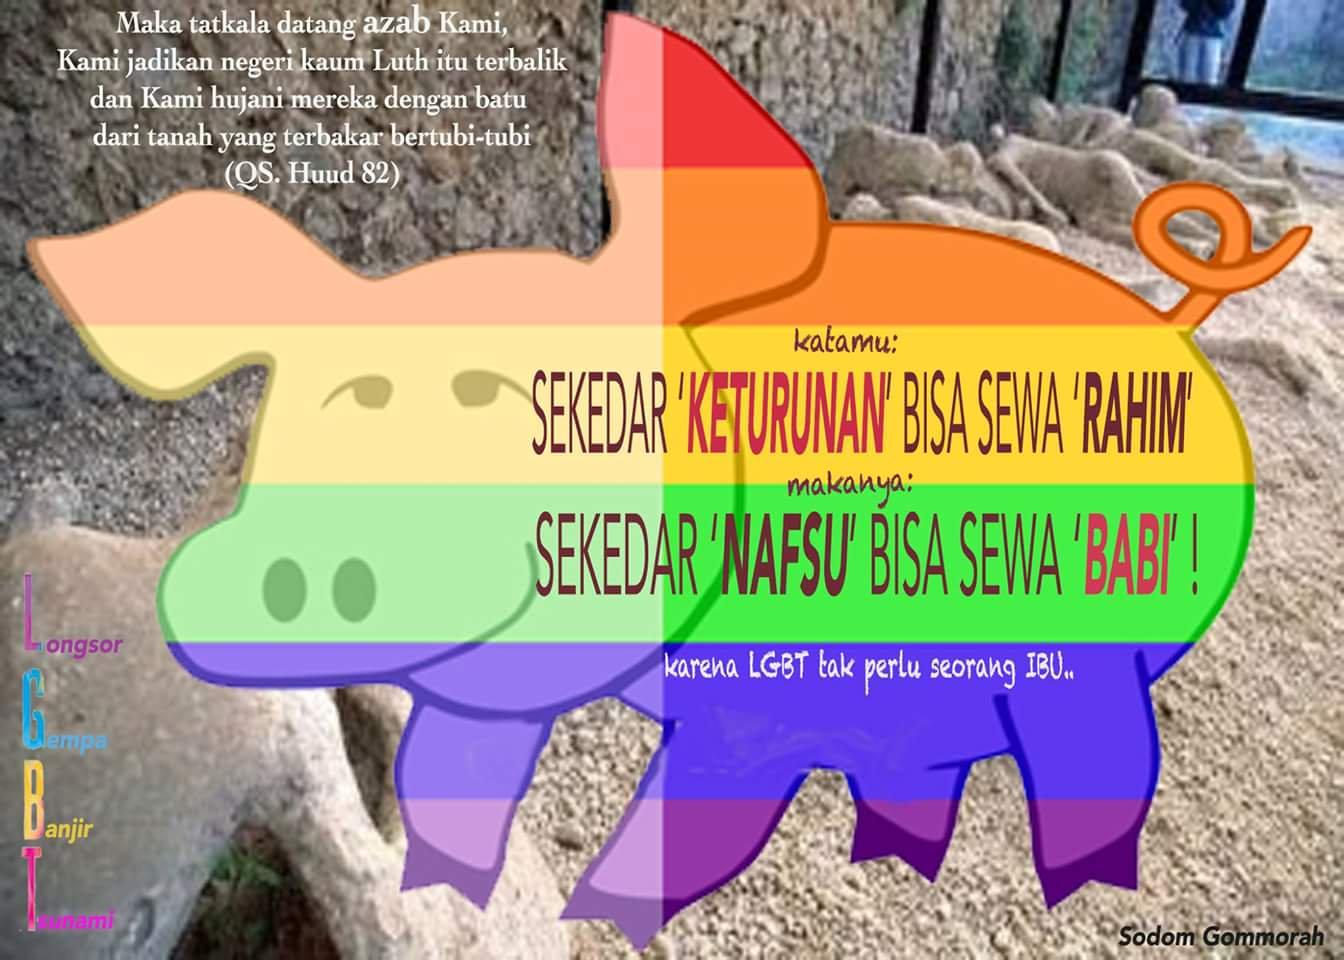 Dulu Berhijab, Kini Kampanye Pro Kaum Sodom